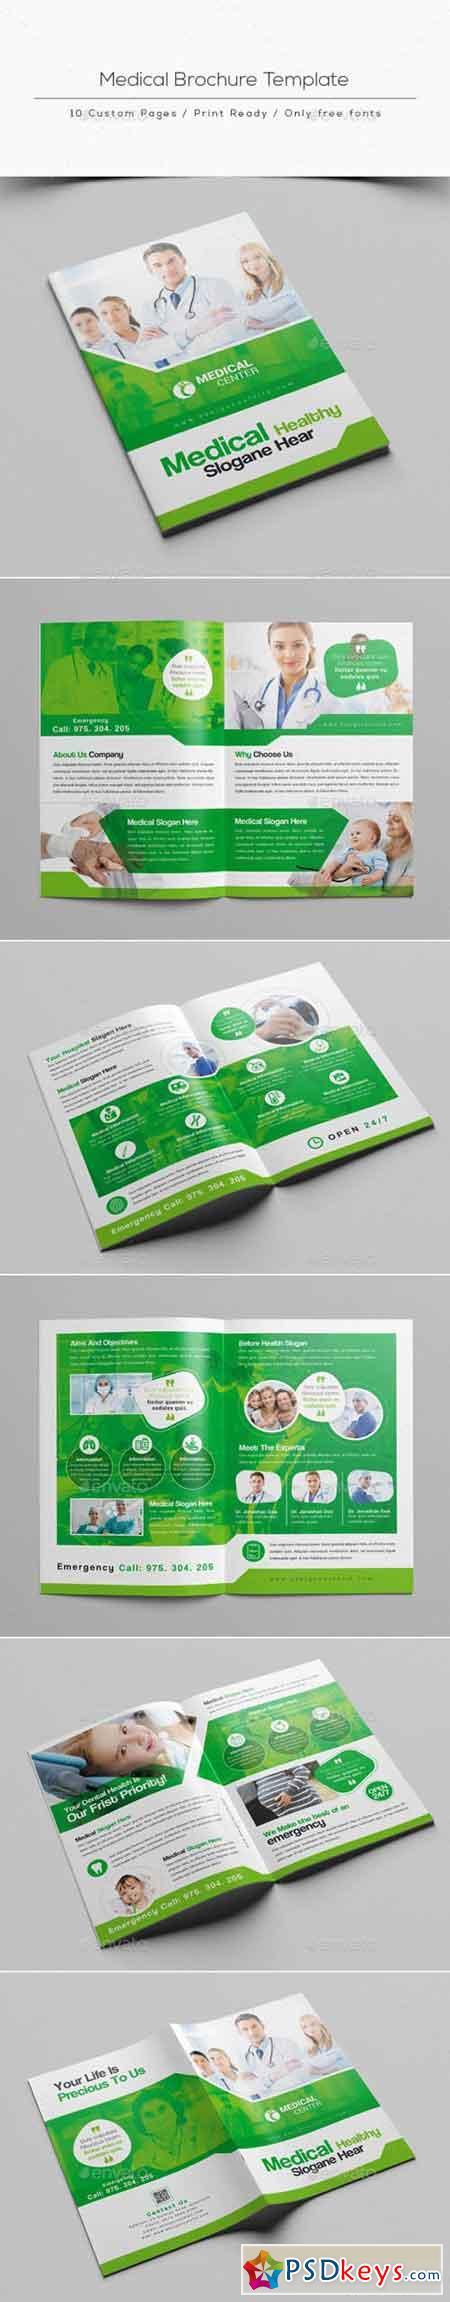 Medical Brochure Template 20856321